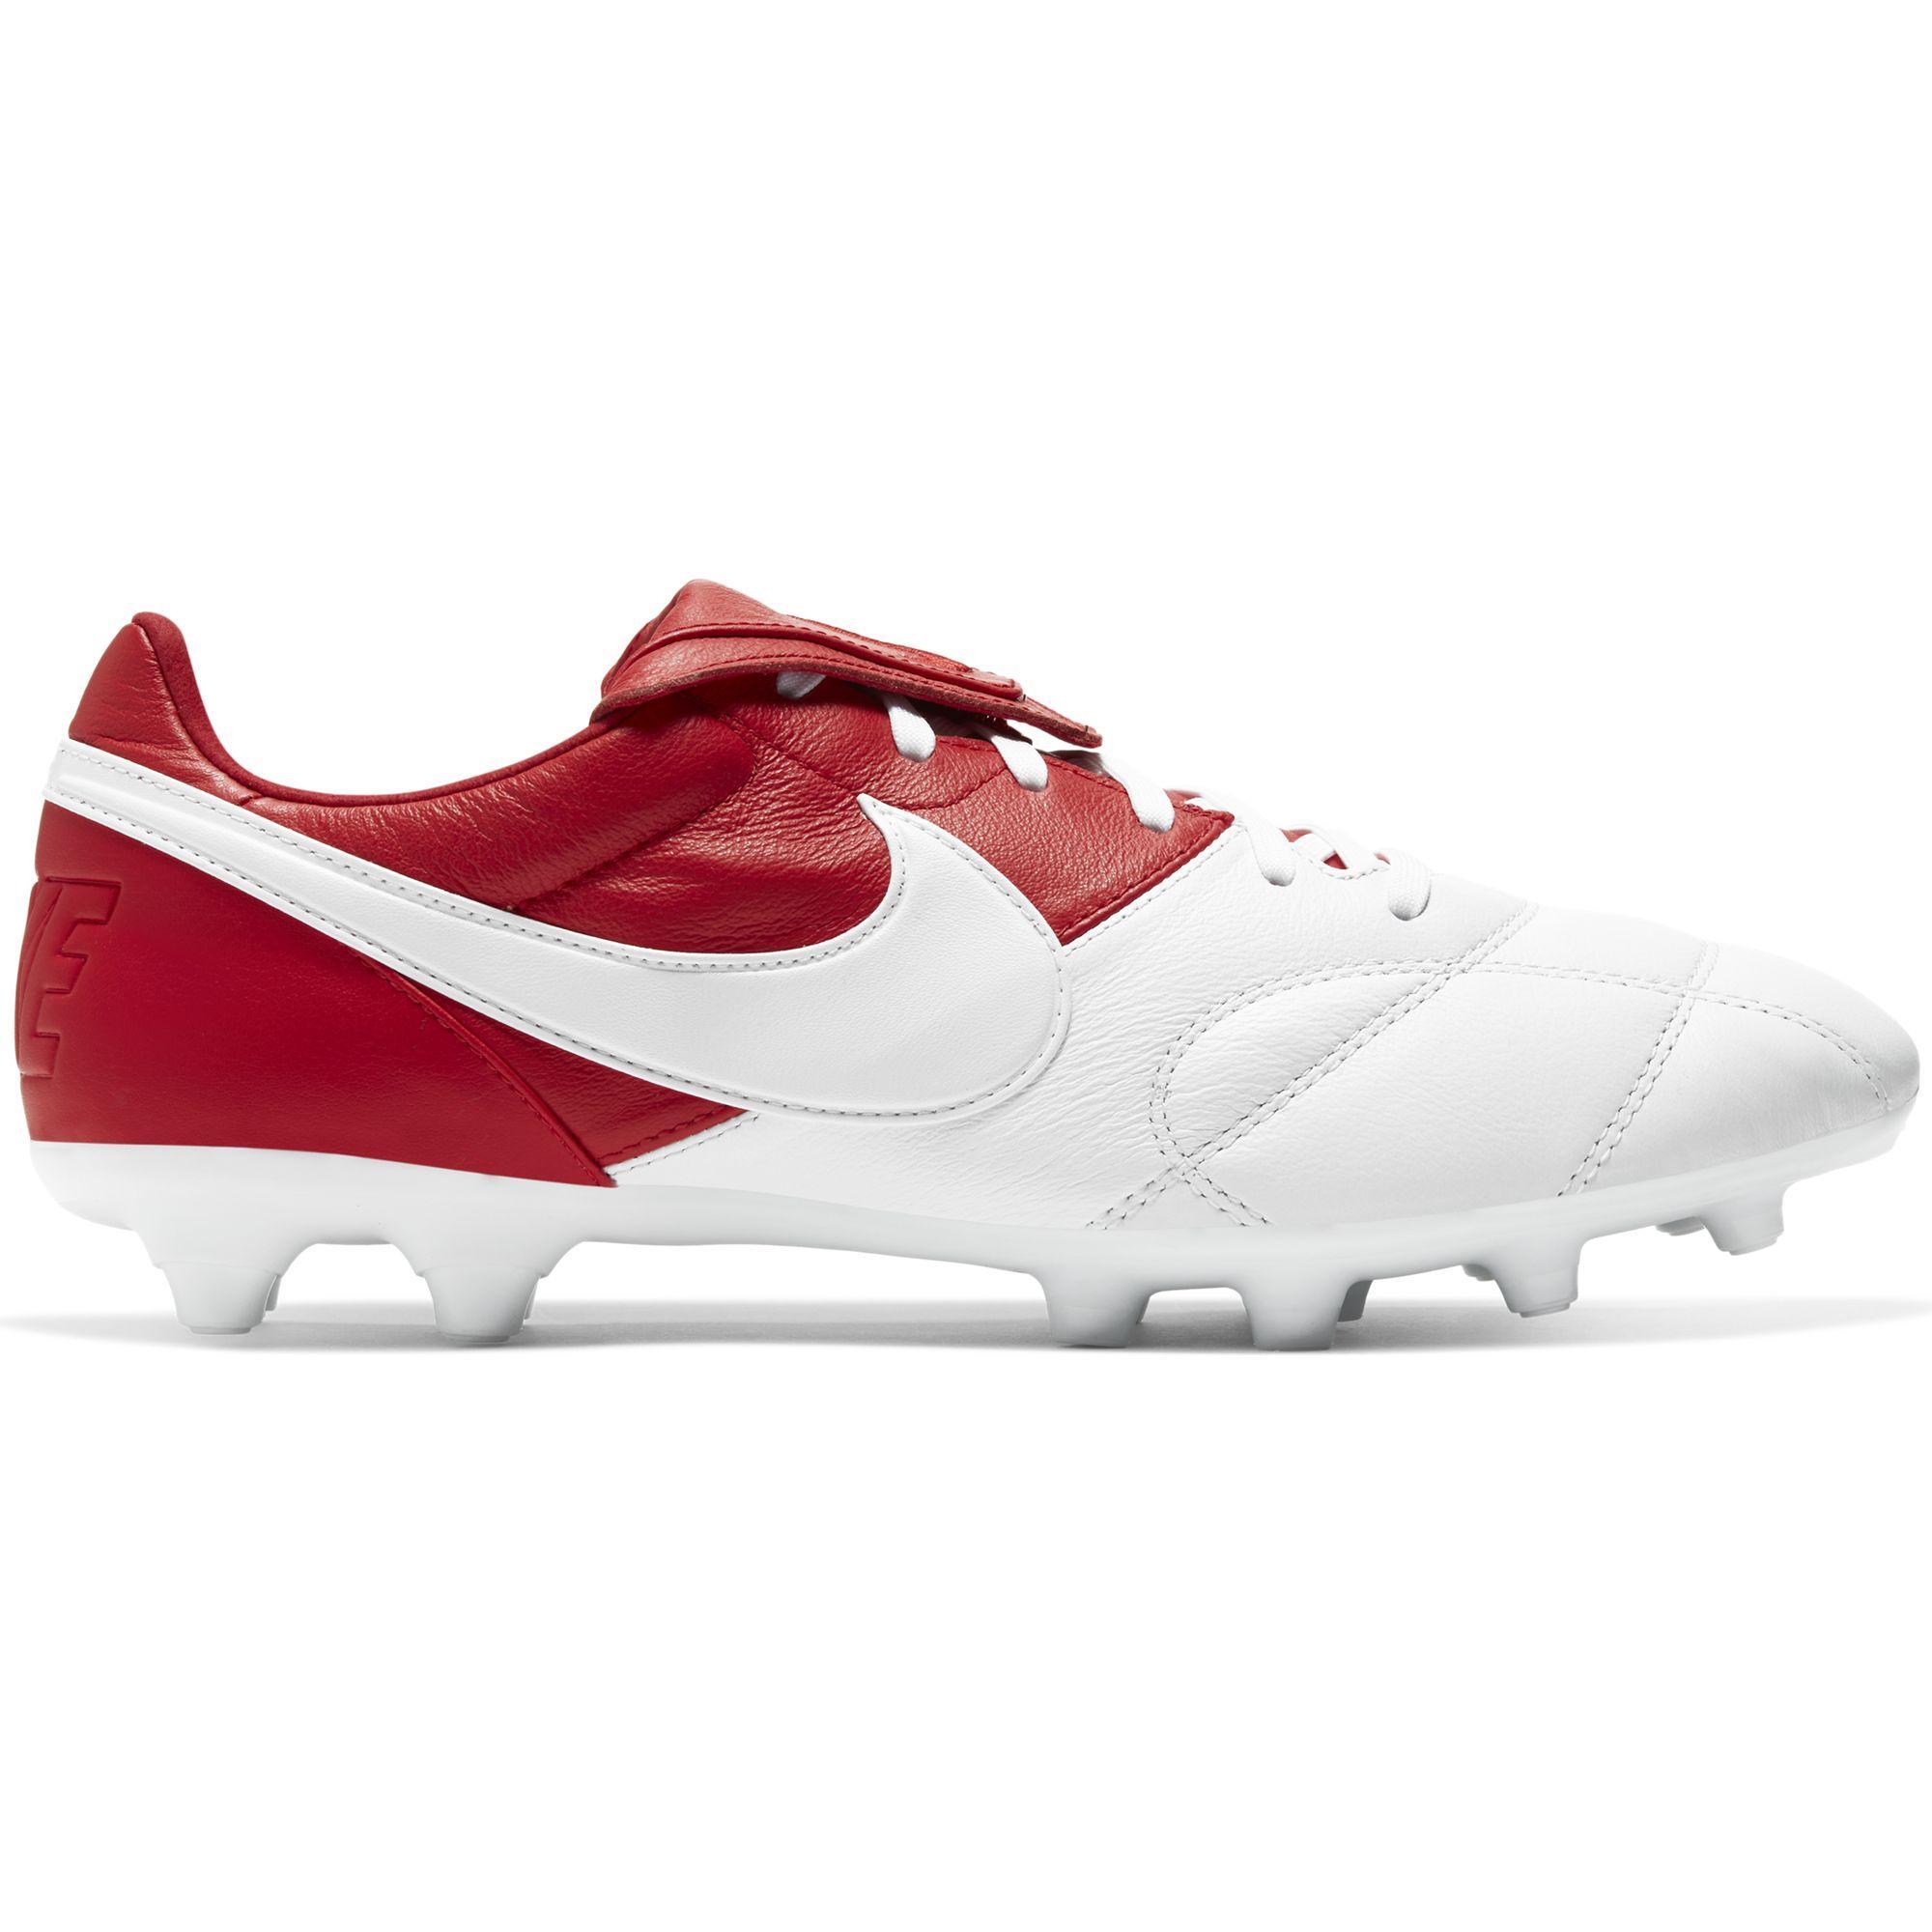 Nike Scarpe Calcio Premier Ii Fg